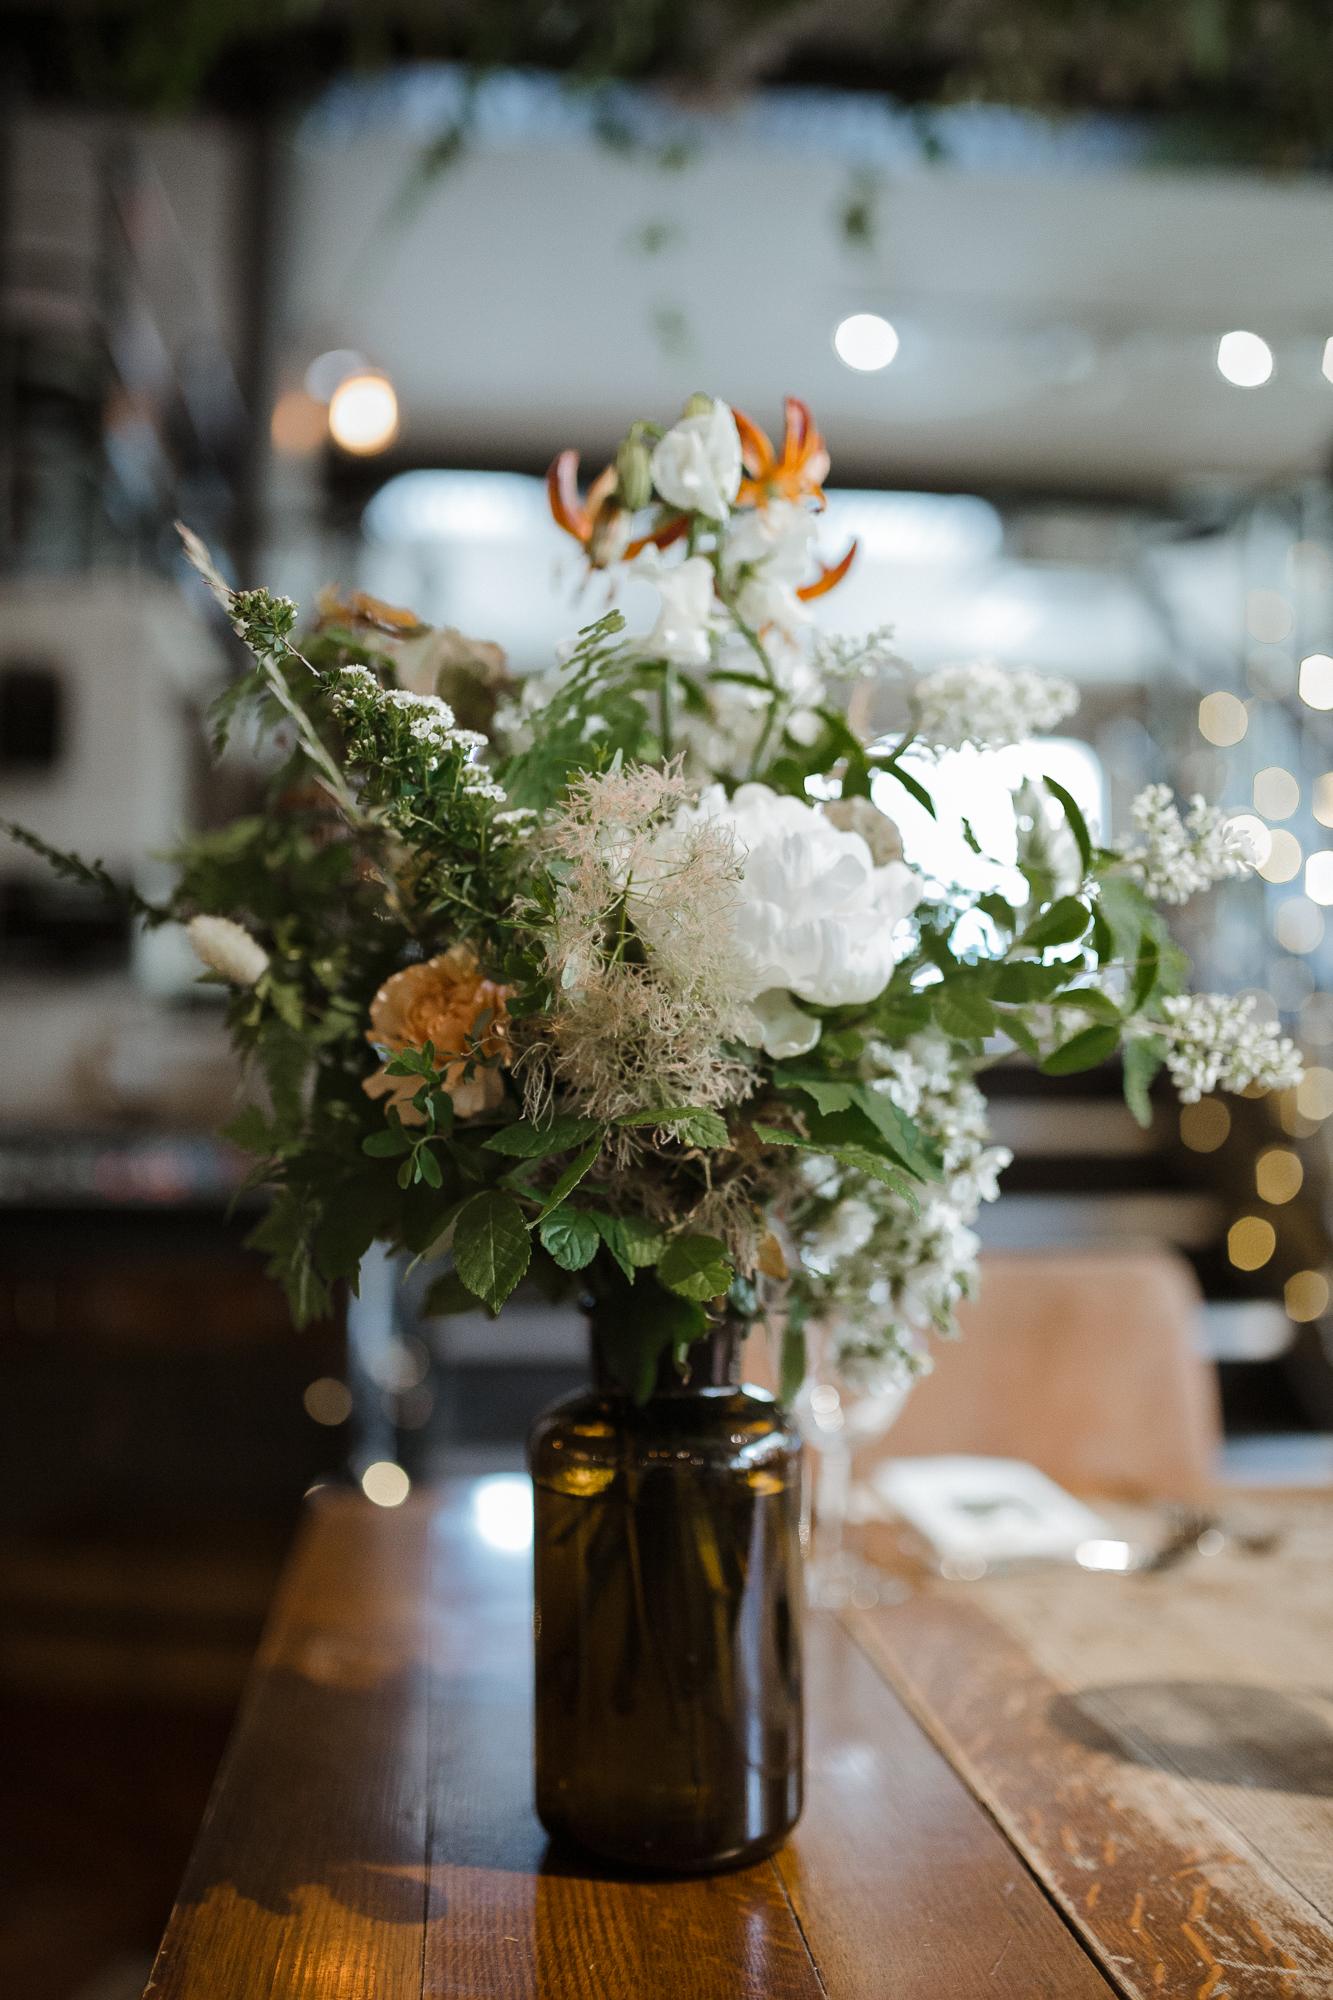 Nicebunch wedding flowers sula london-islington-town-hall-depot-n7 ethical british luxury bottles ferns peonies stephanie-green-wedding-photography